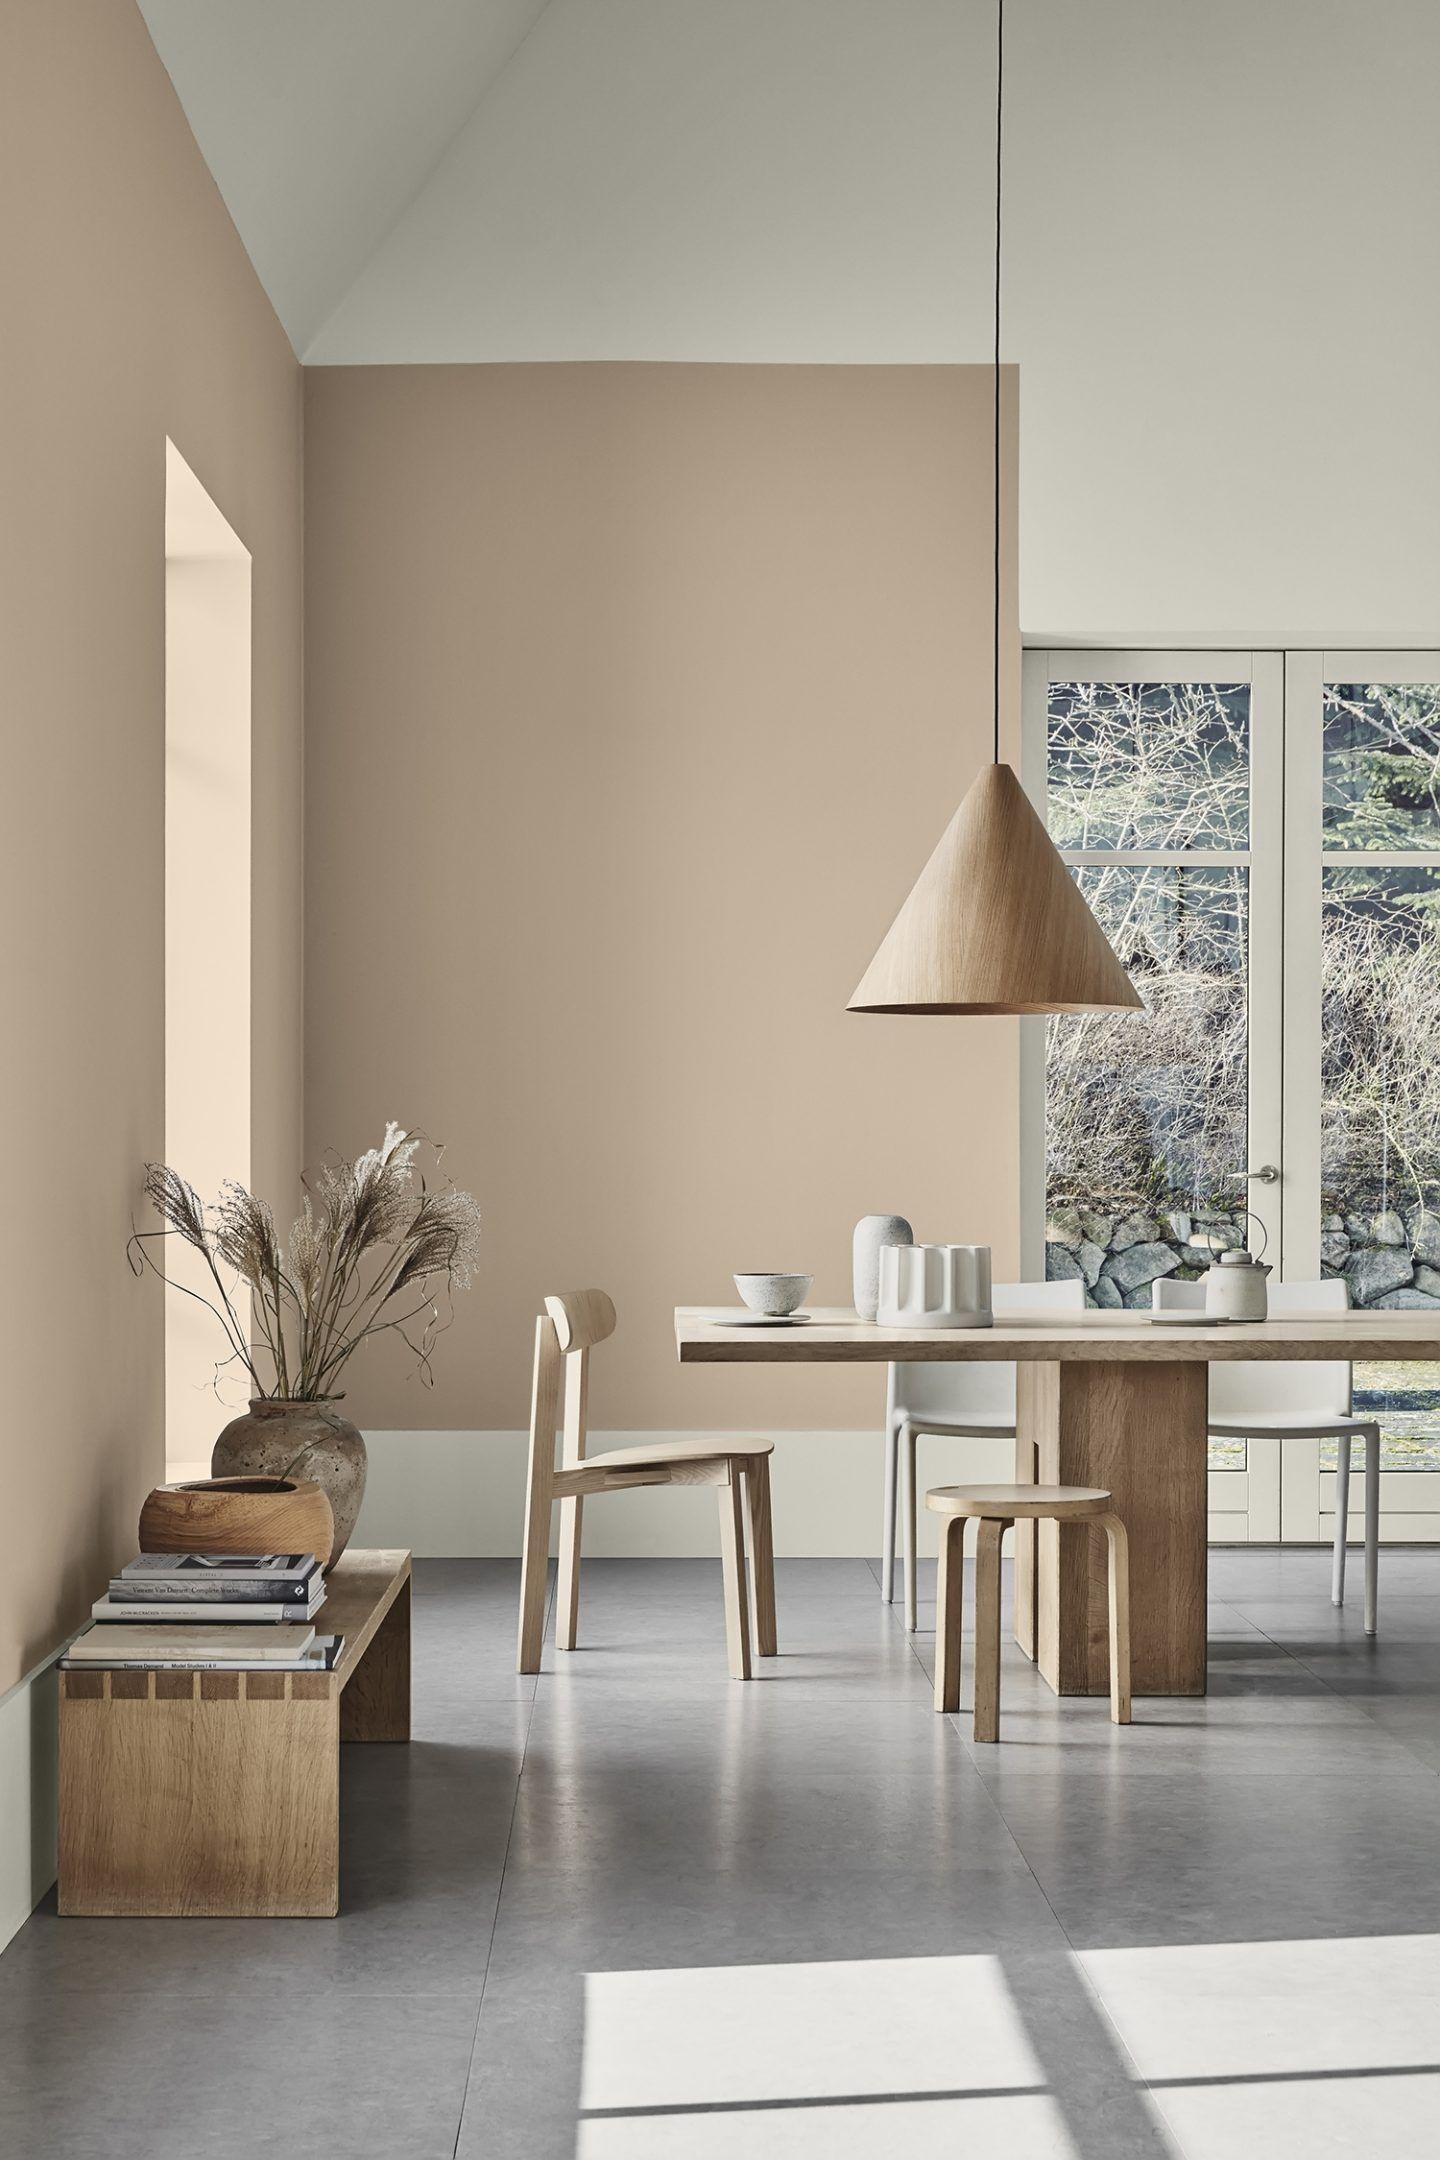 Identity Jotun Lady New Color Chart 2019 Only Deco Love Minimalist Dining Room Scandinavian Interior Design House Interior